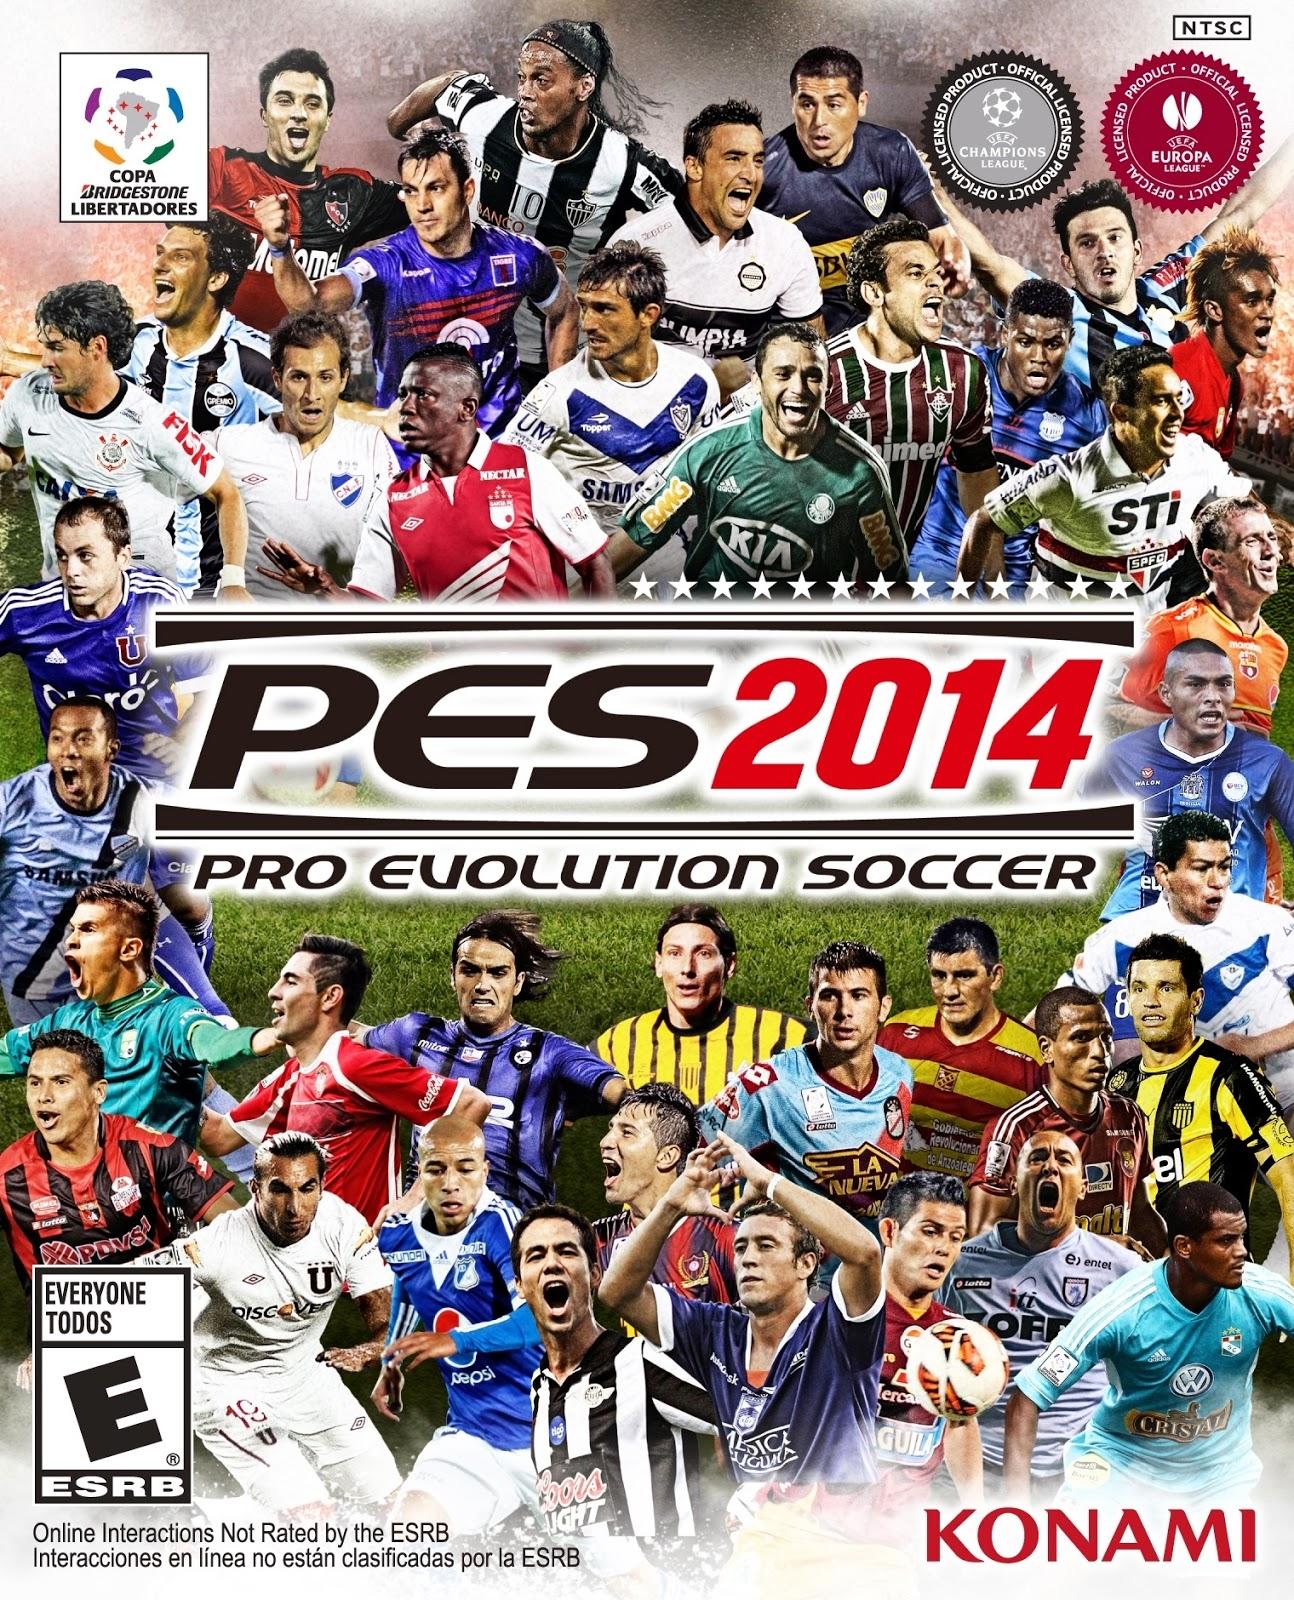 Pes 12 ps2 download free